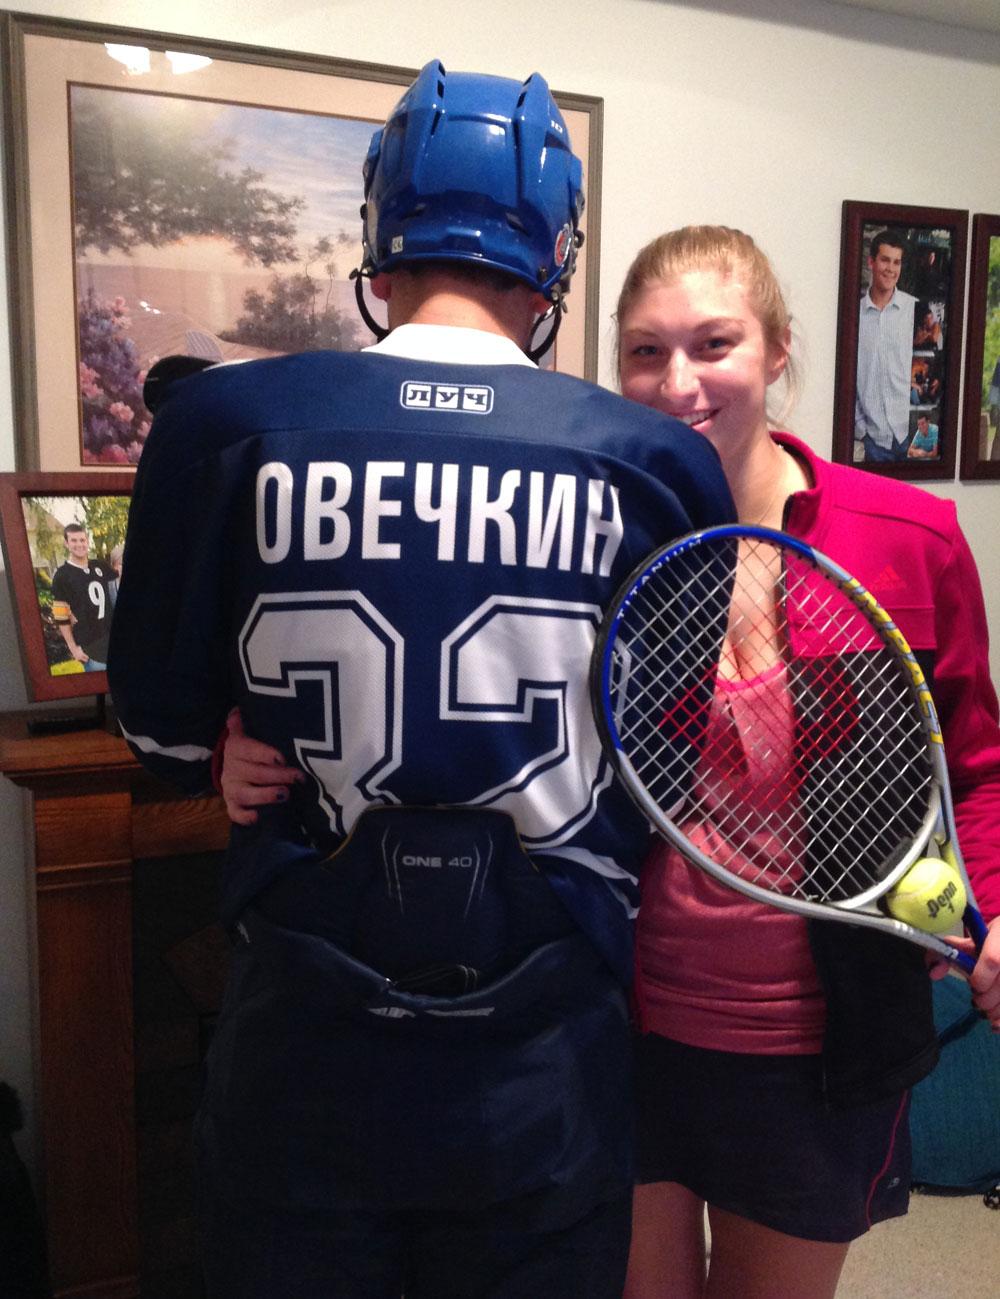 Maria kirilenko dating alex ovechkin jersey